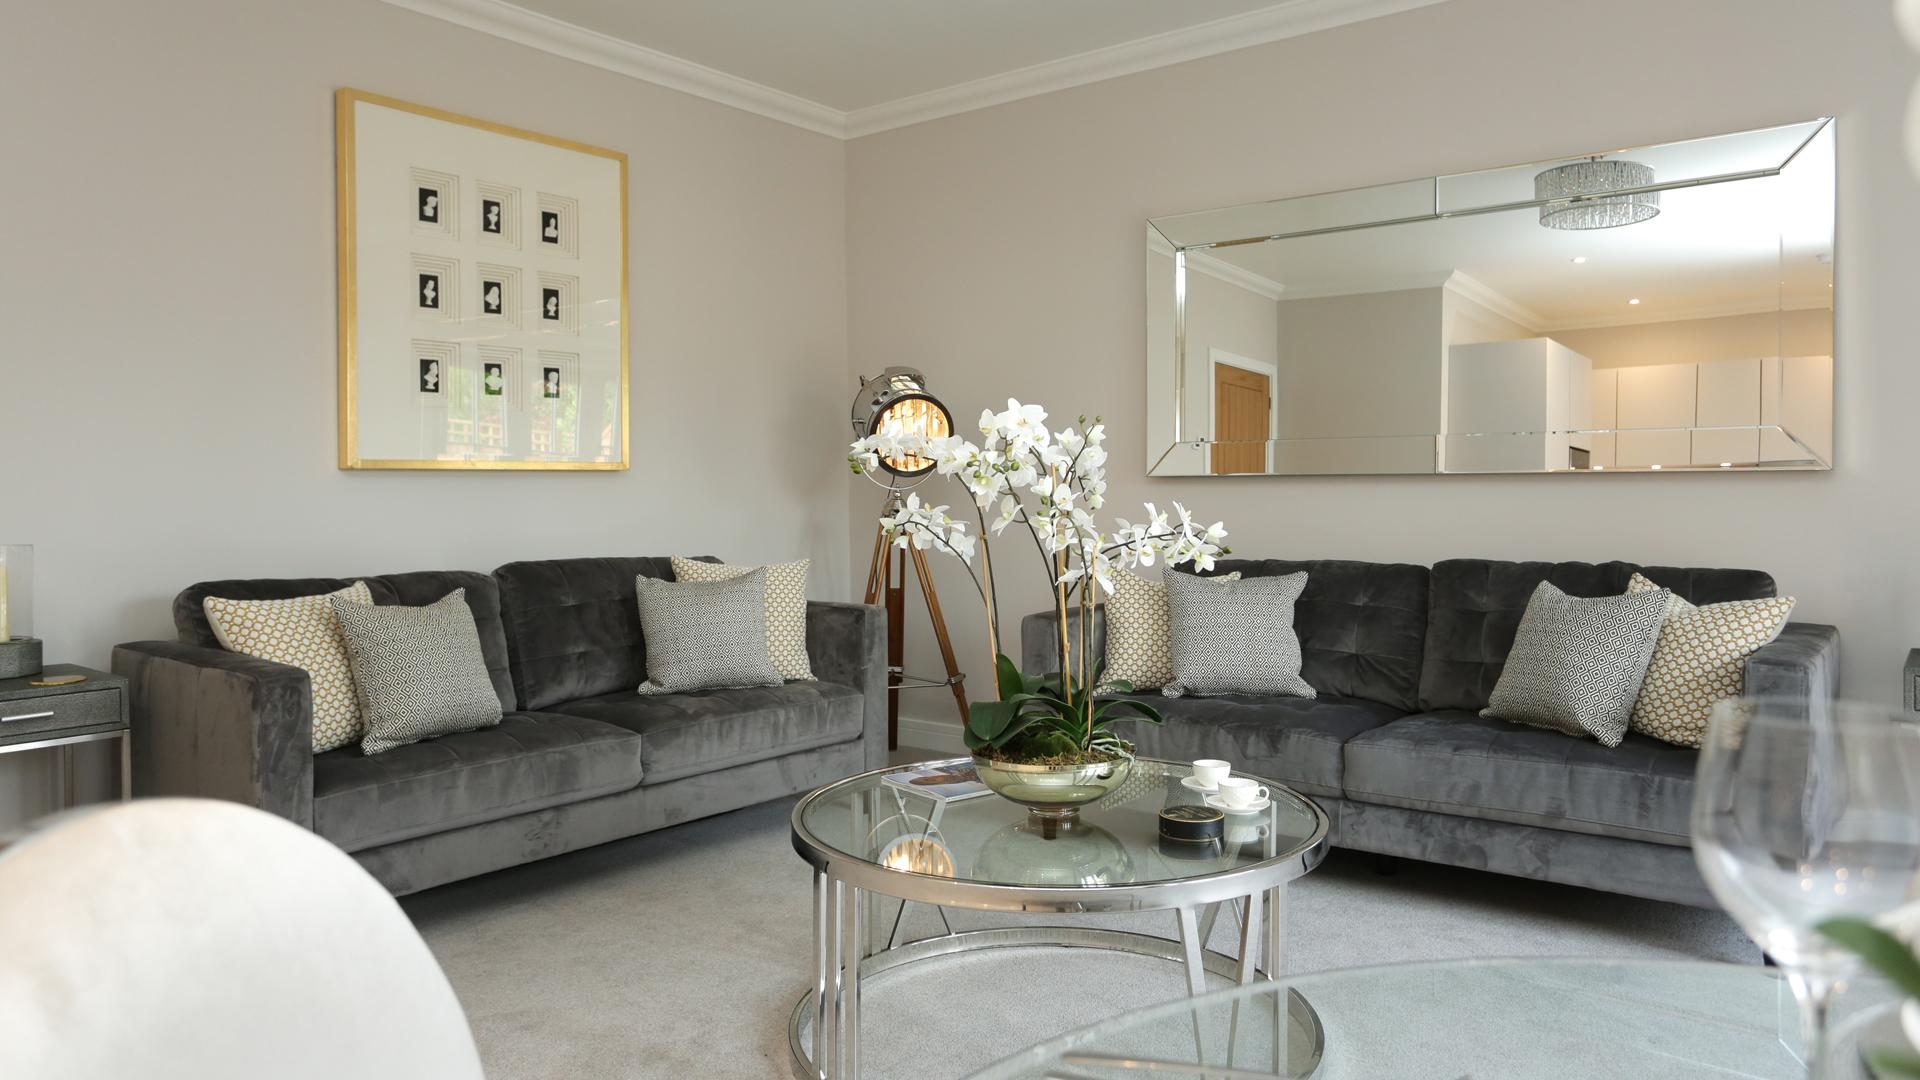 Cobnut Park living room with a mirror, photo and grey sofas.